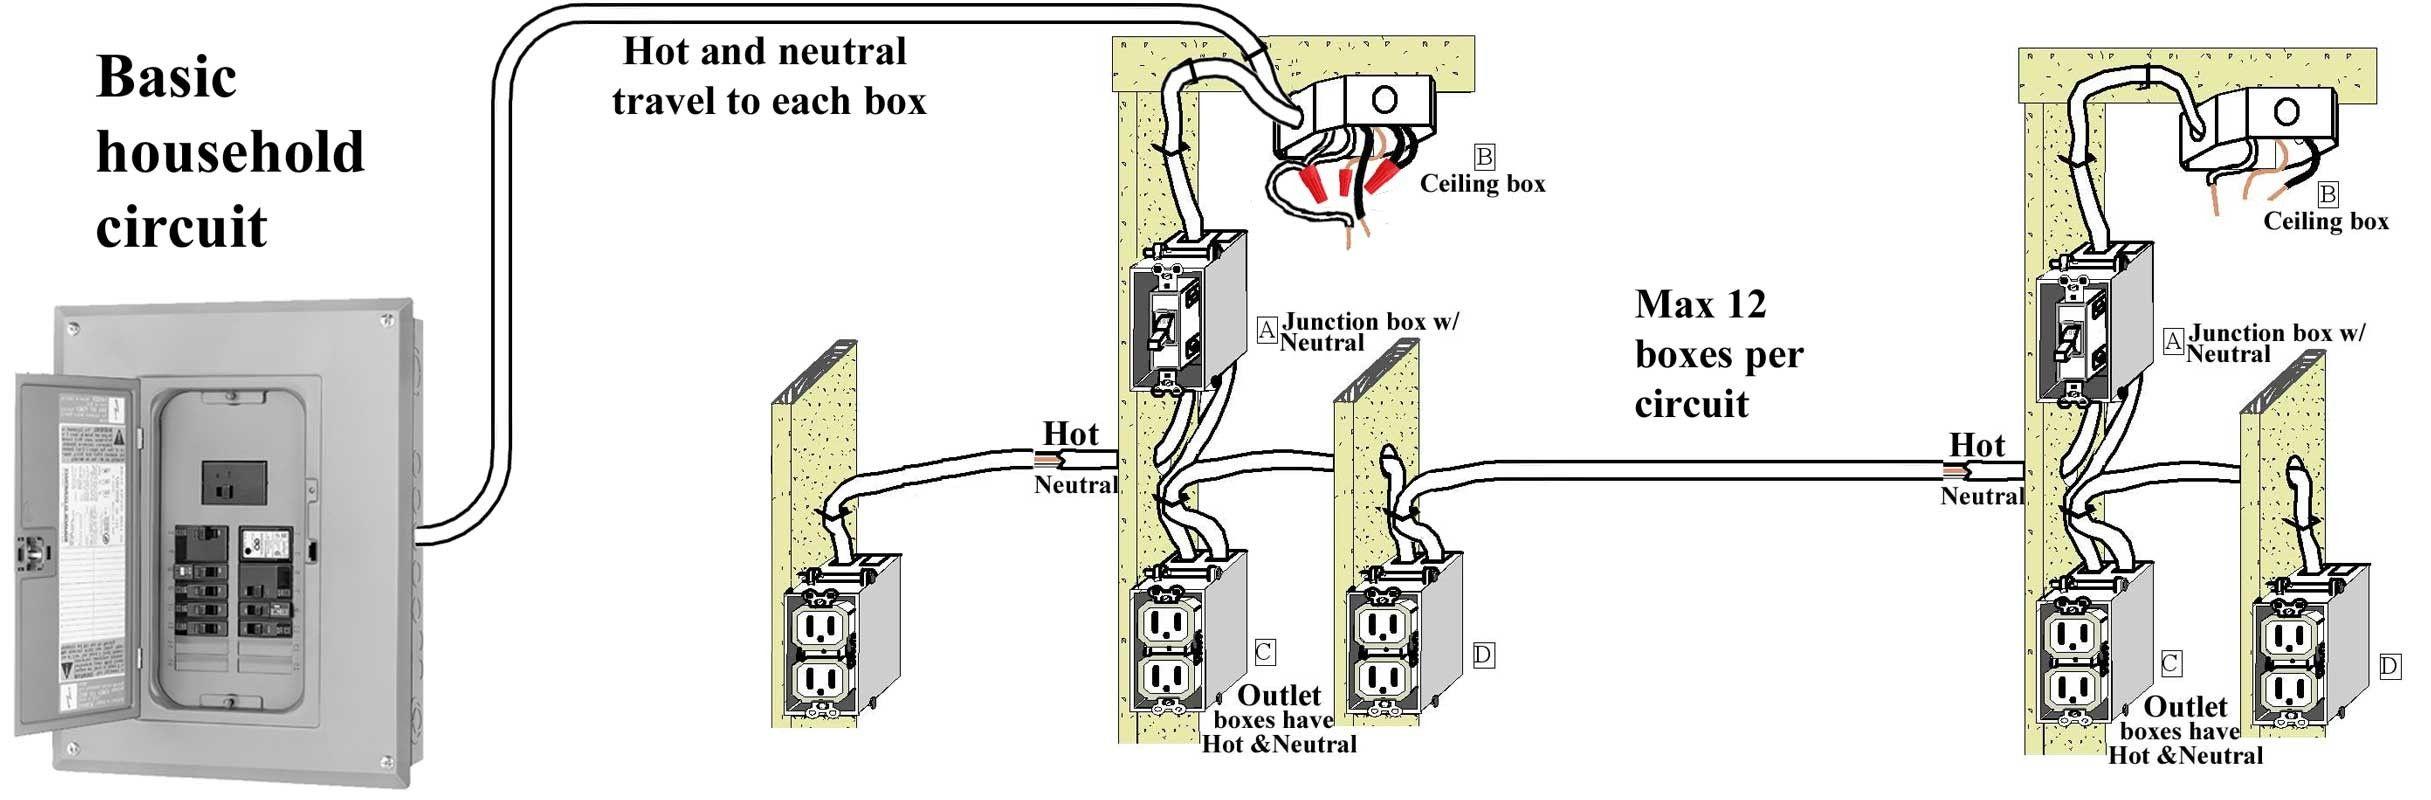 small resolution of domestic electrical wiring diagram books diagram diagramtemplate diagramsample